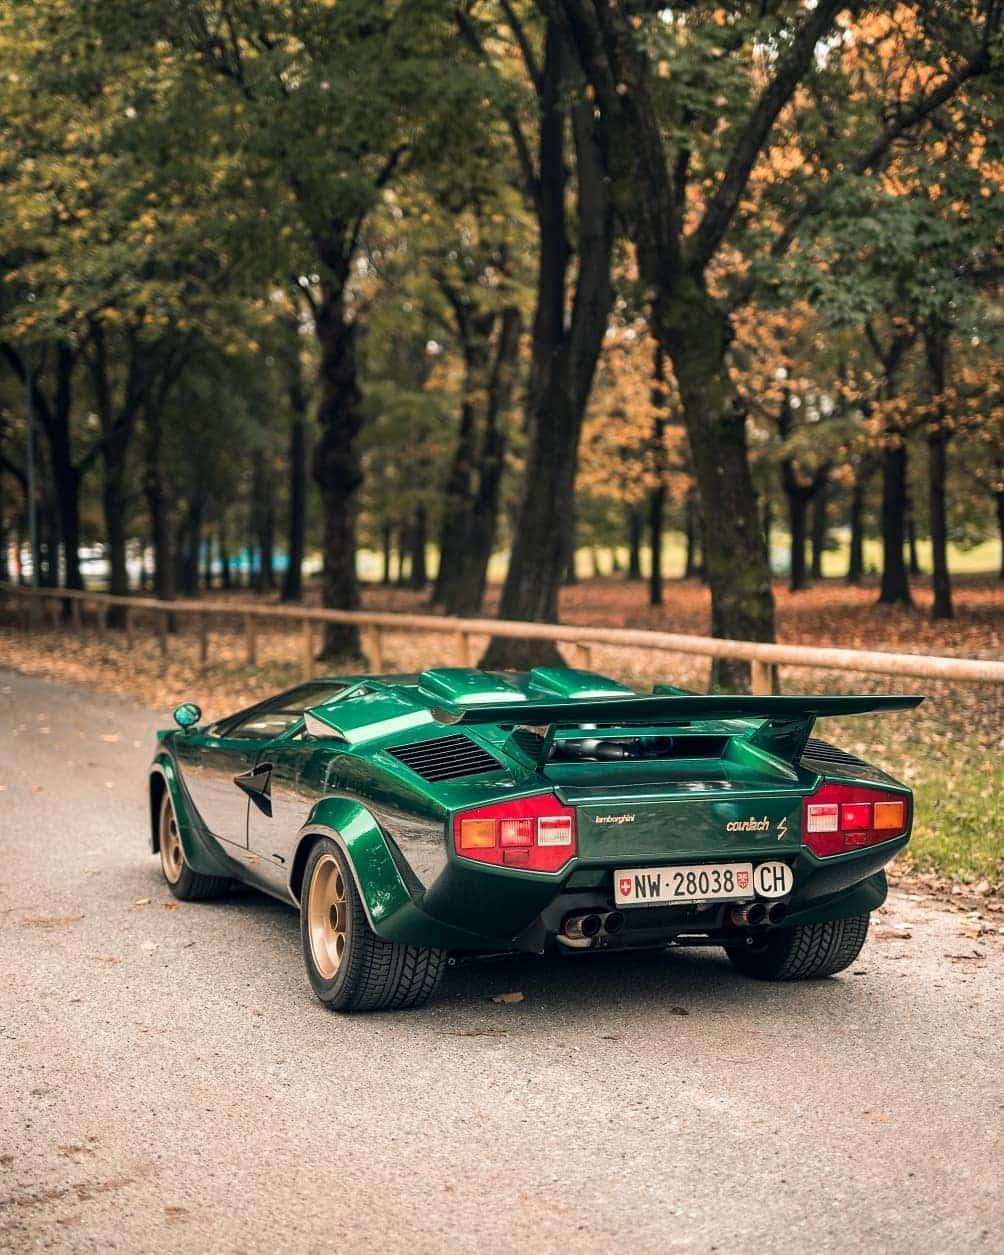 Lamborghini Countach @davidclementephotography - Image 2